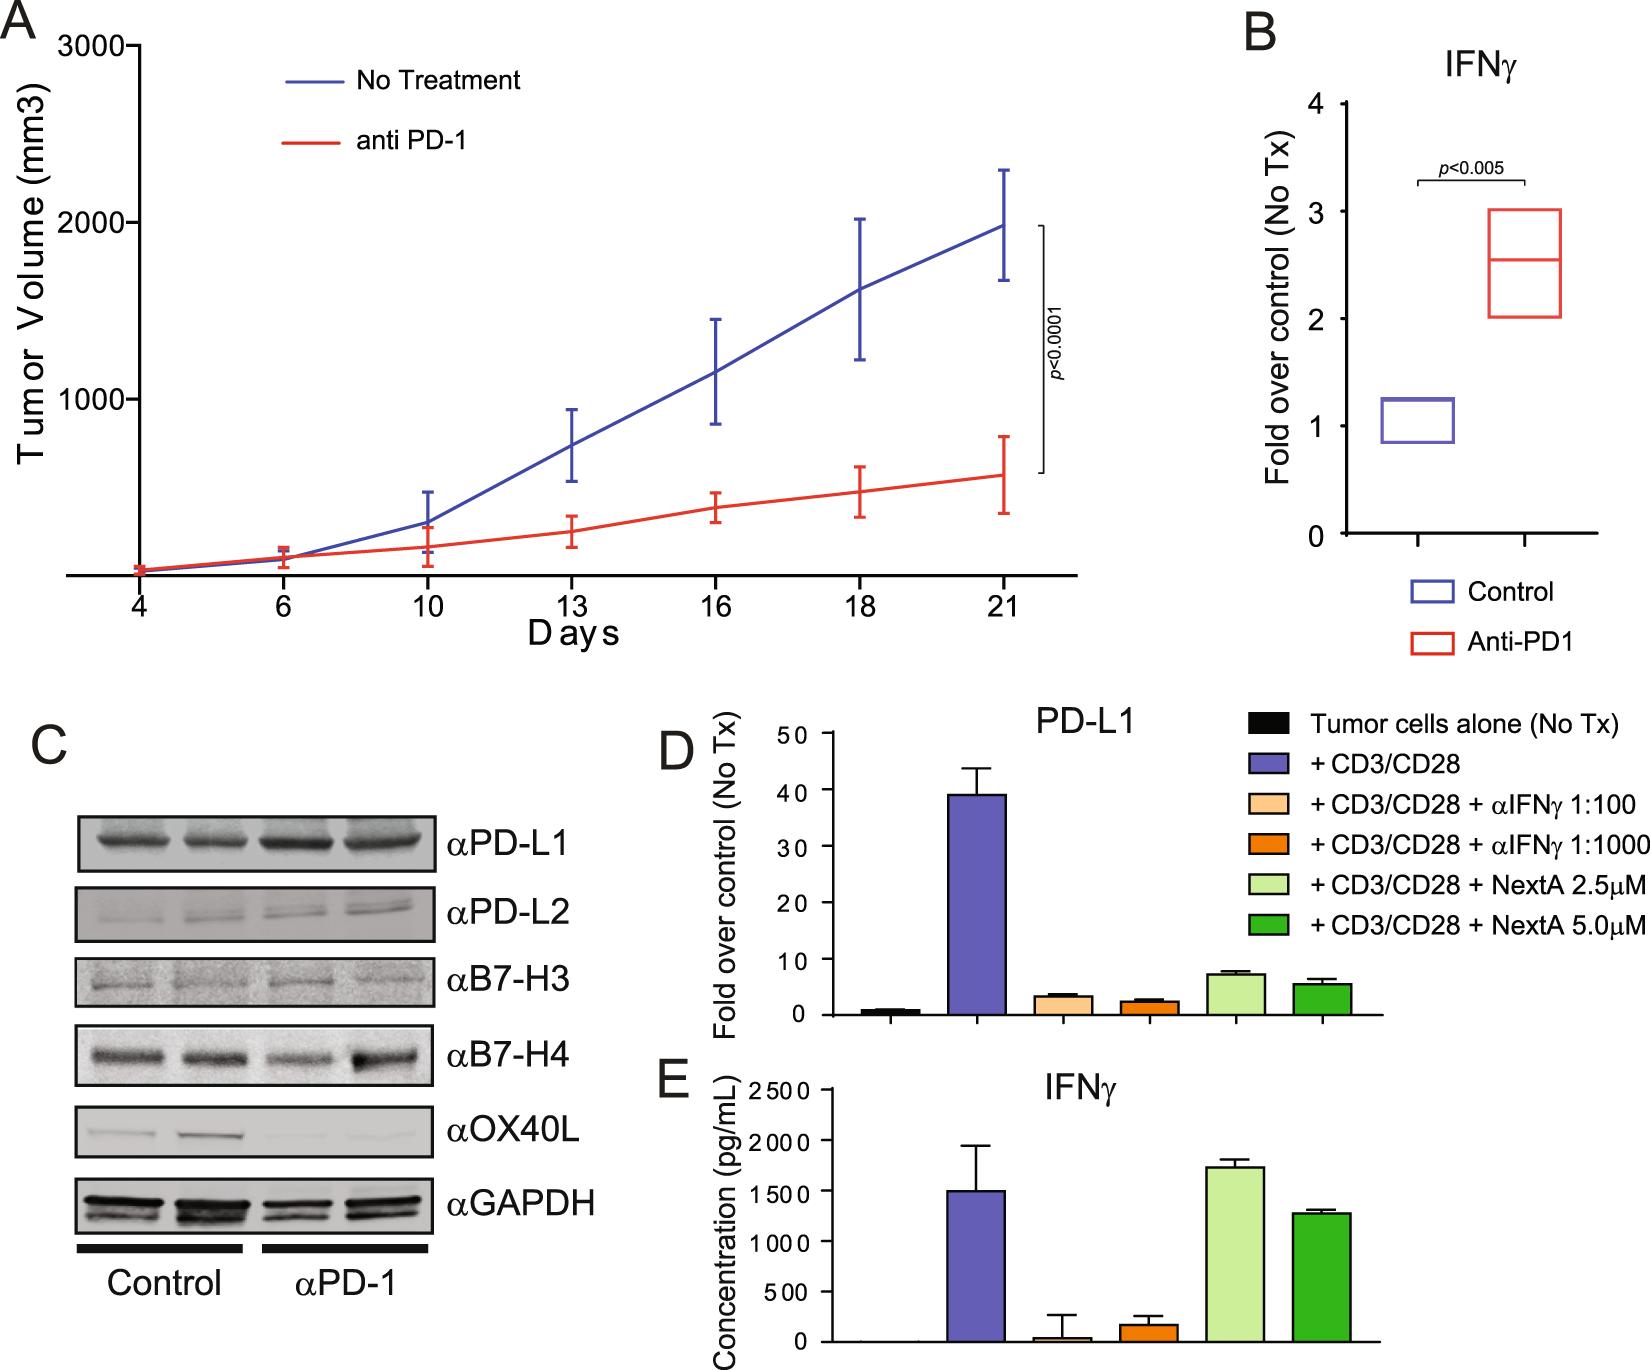 Selective HDAC6 inhibitors improve anti-PD-1 immune